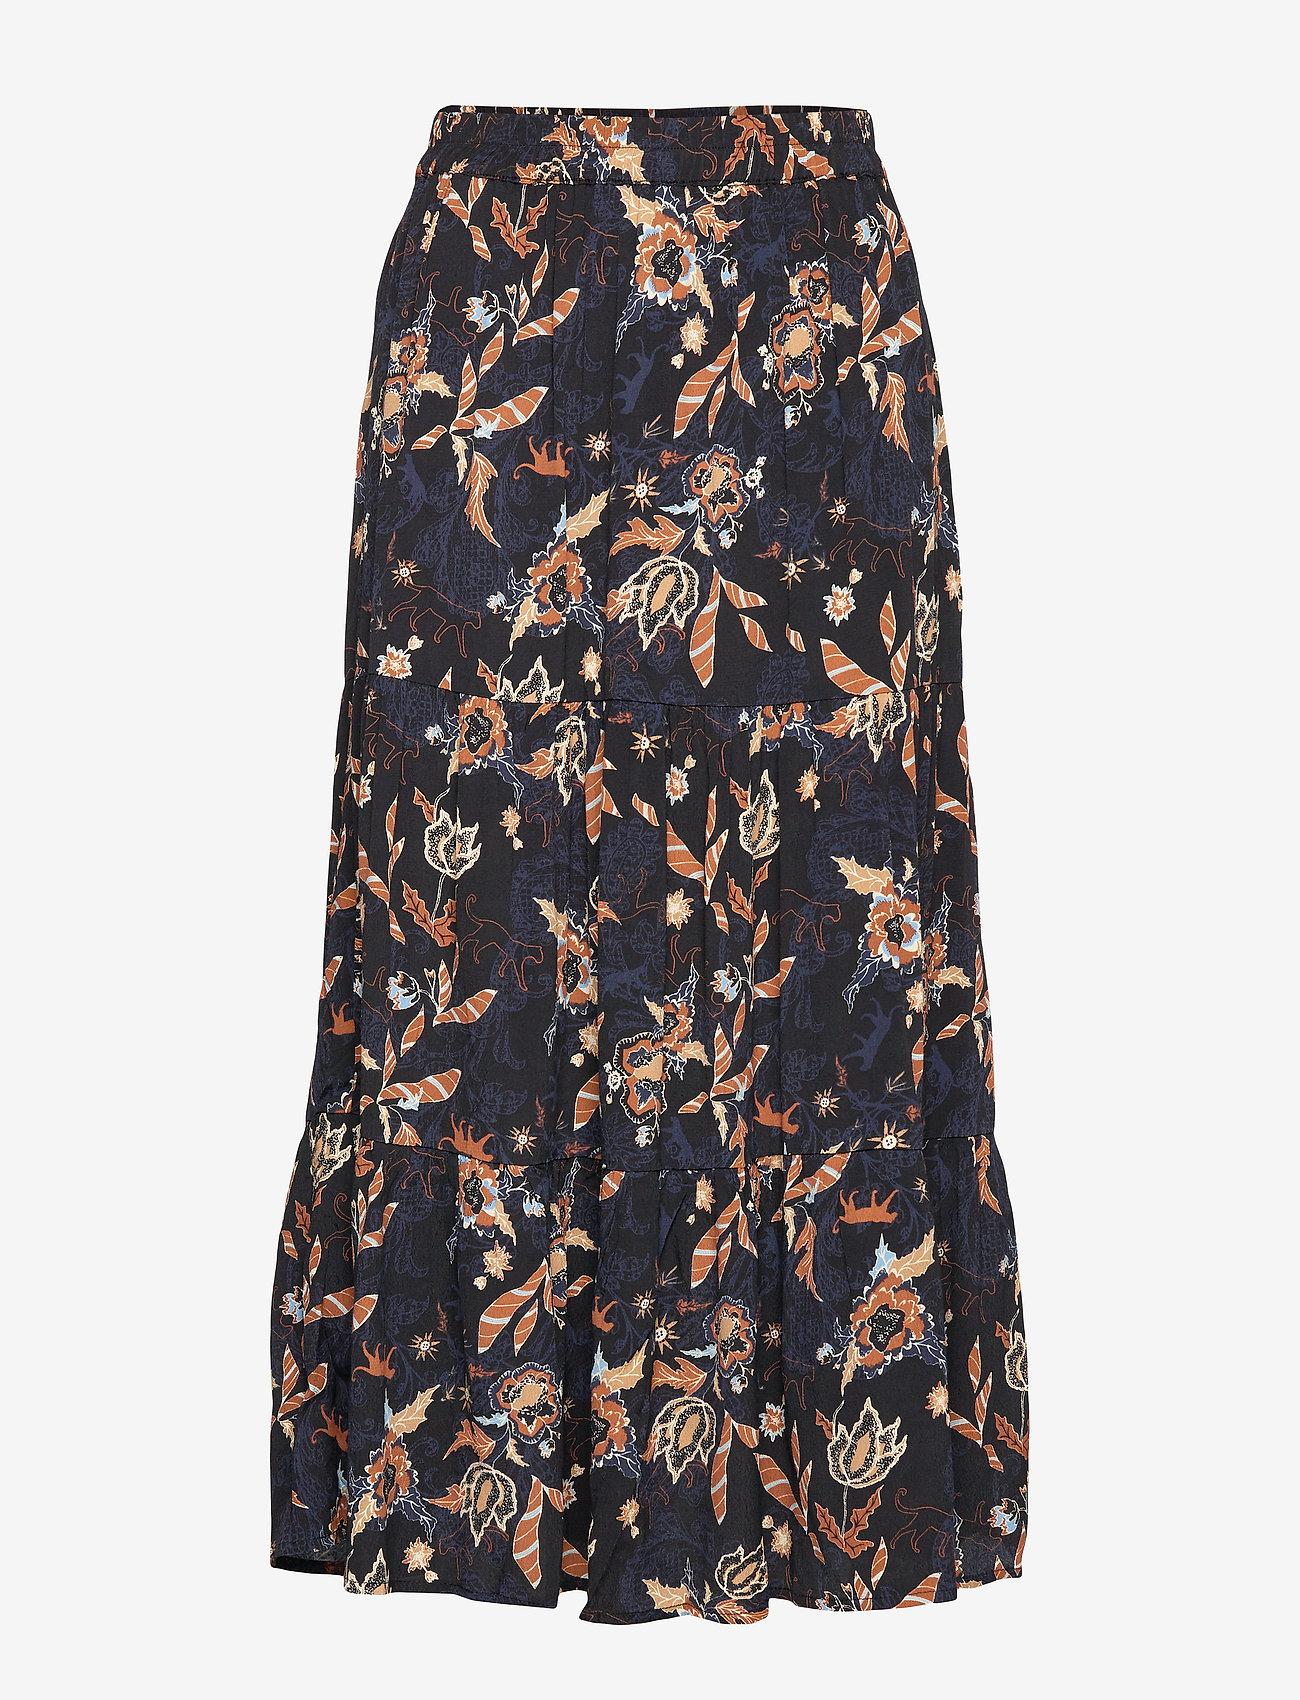 Birla Skirt (Dark Floral Print) - Minus u4zgP8